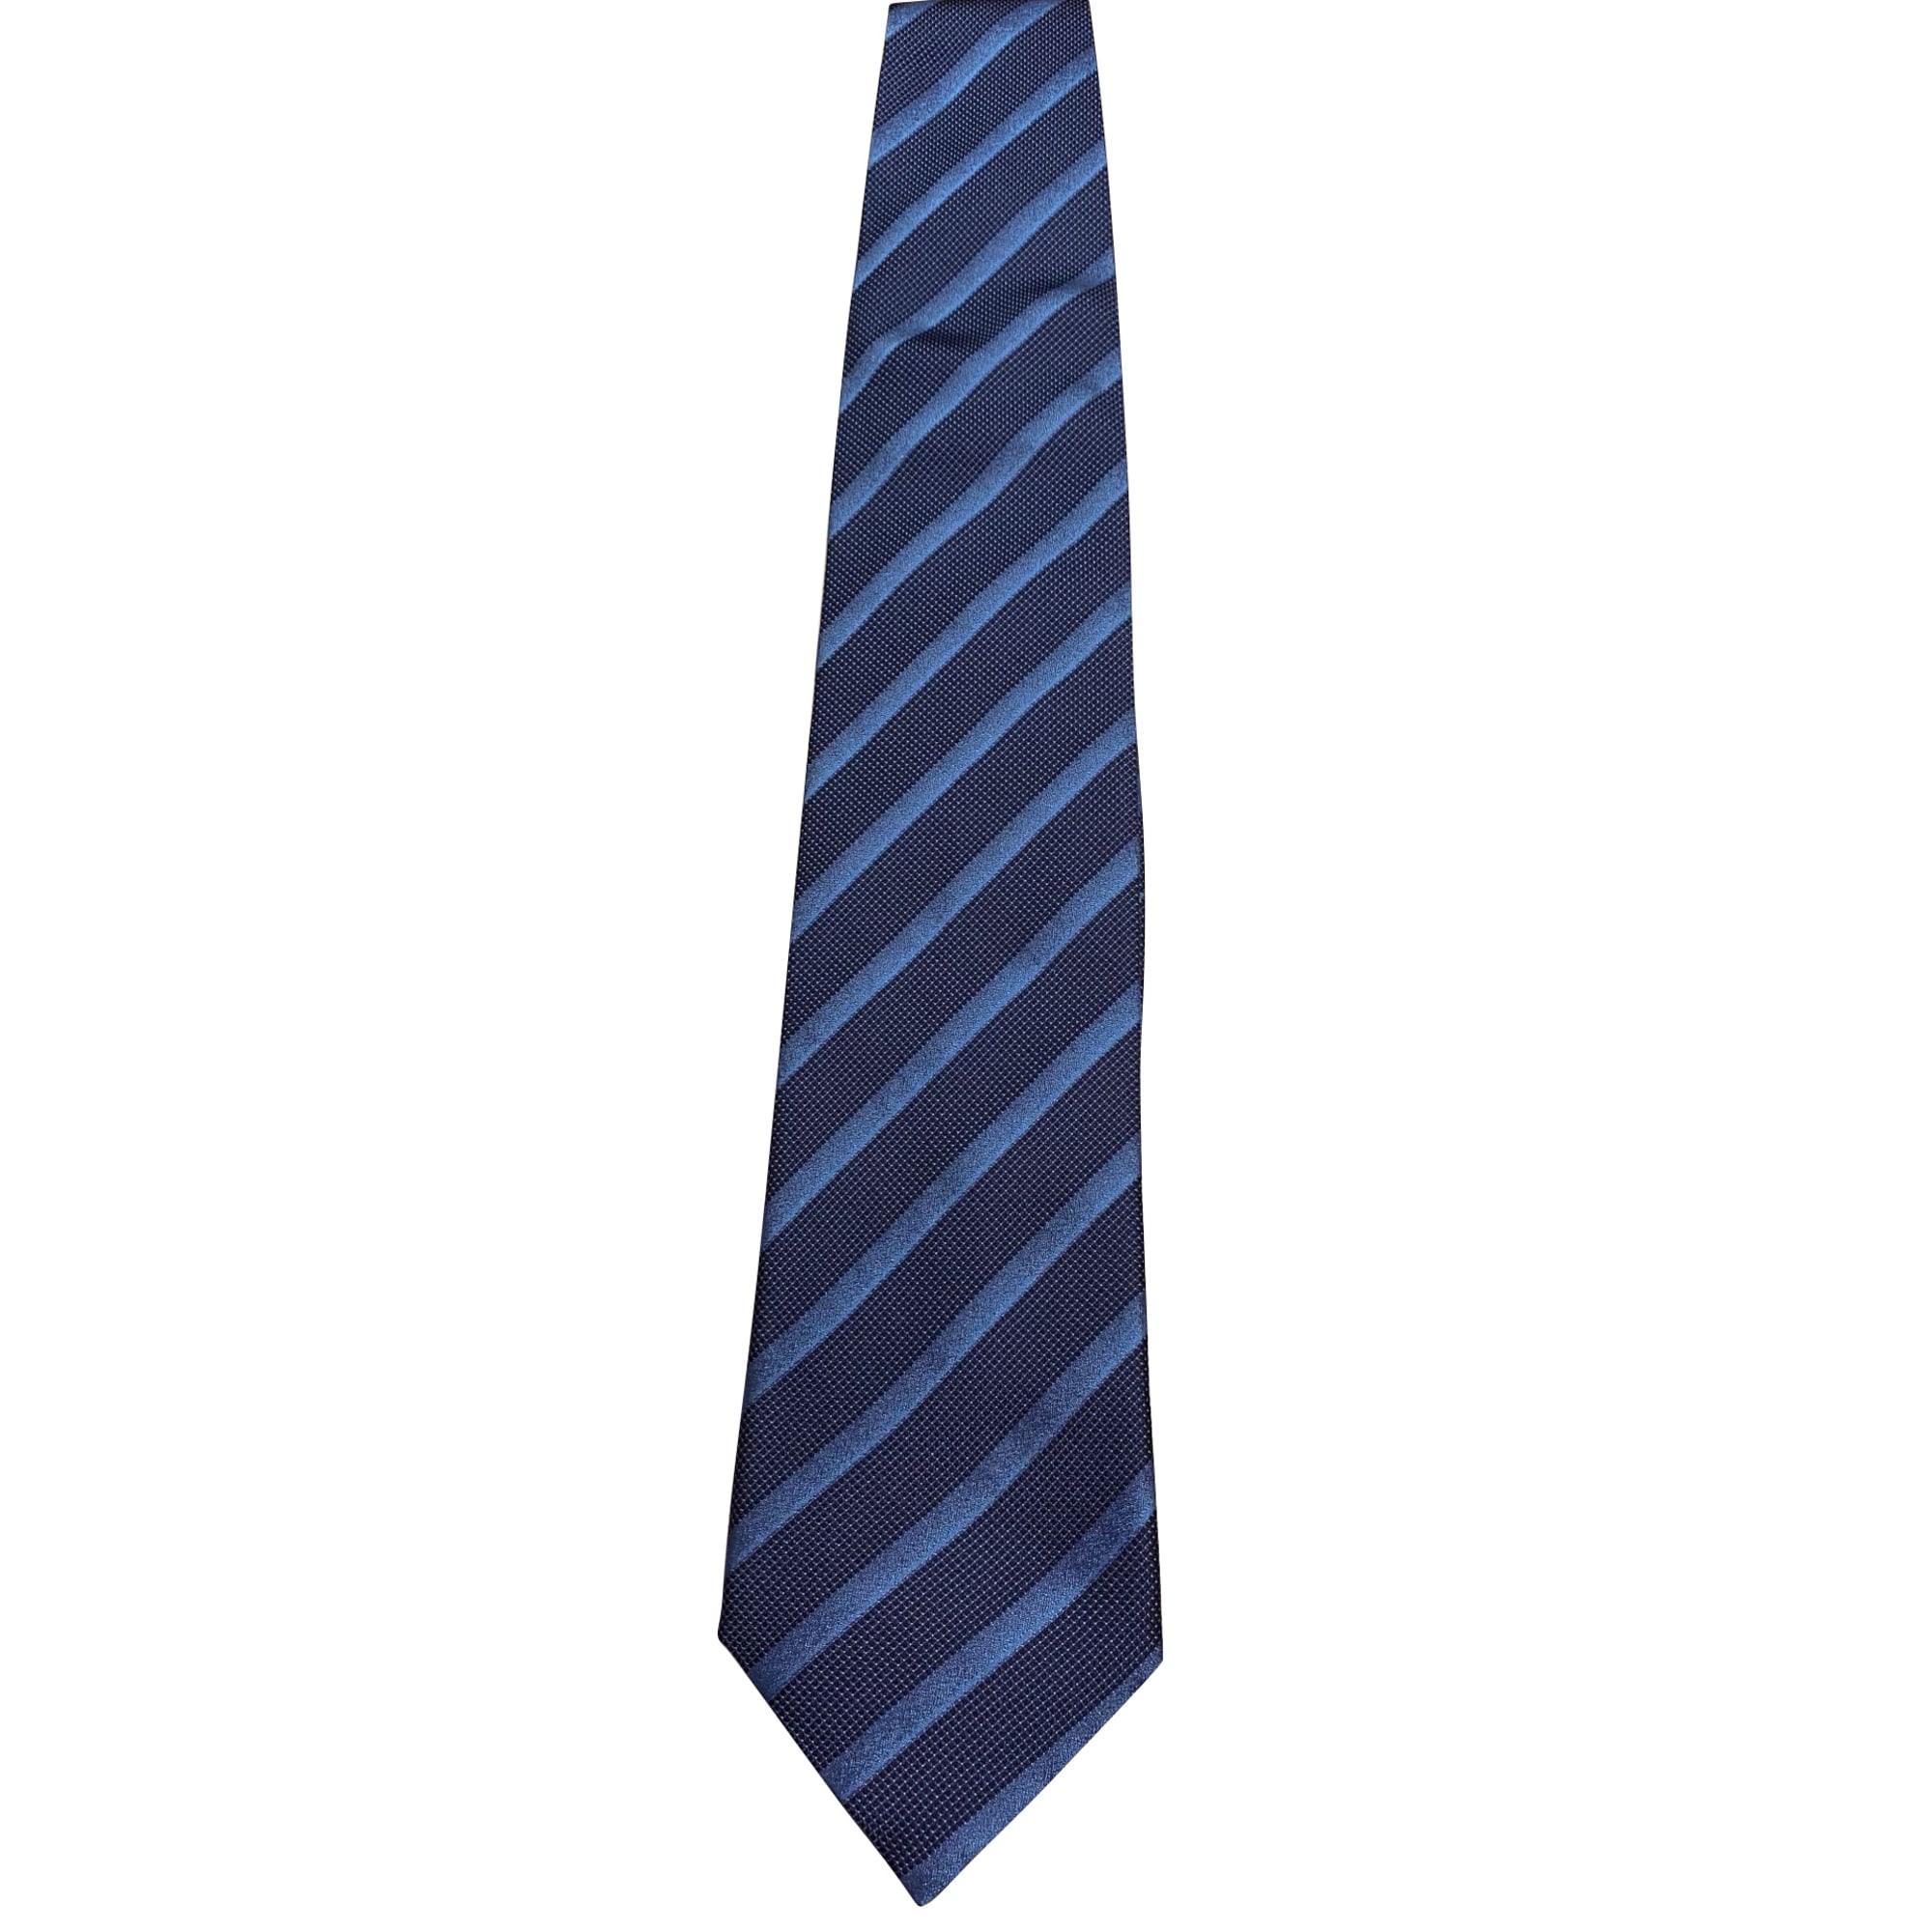 Cravate LANVIN Bleu, bleu marine, bleu turquoise